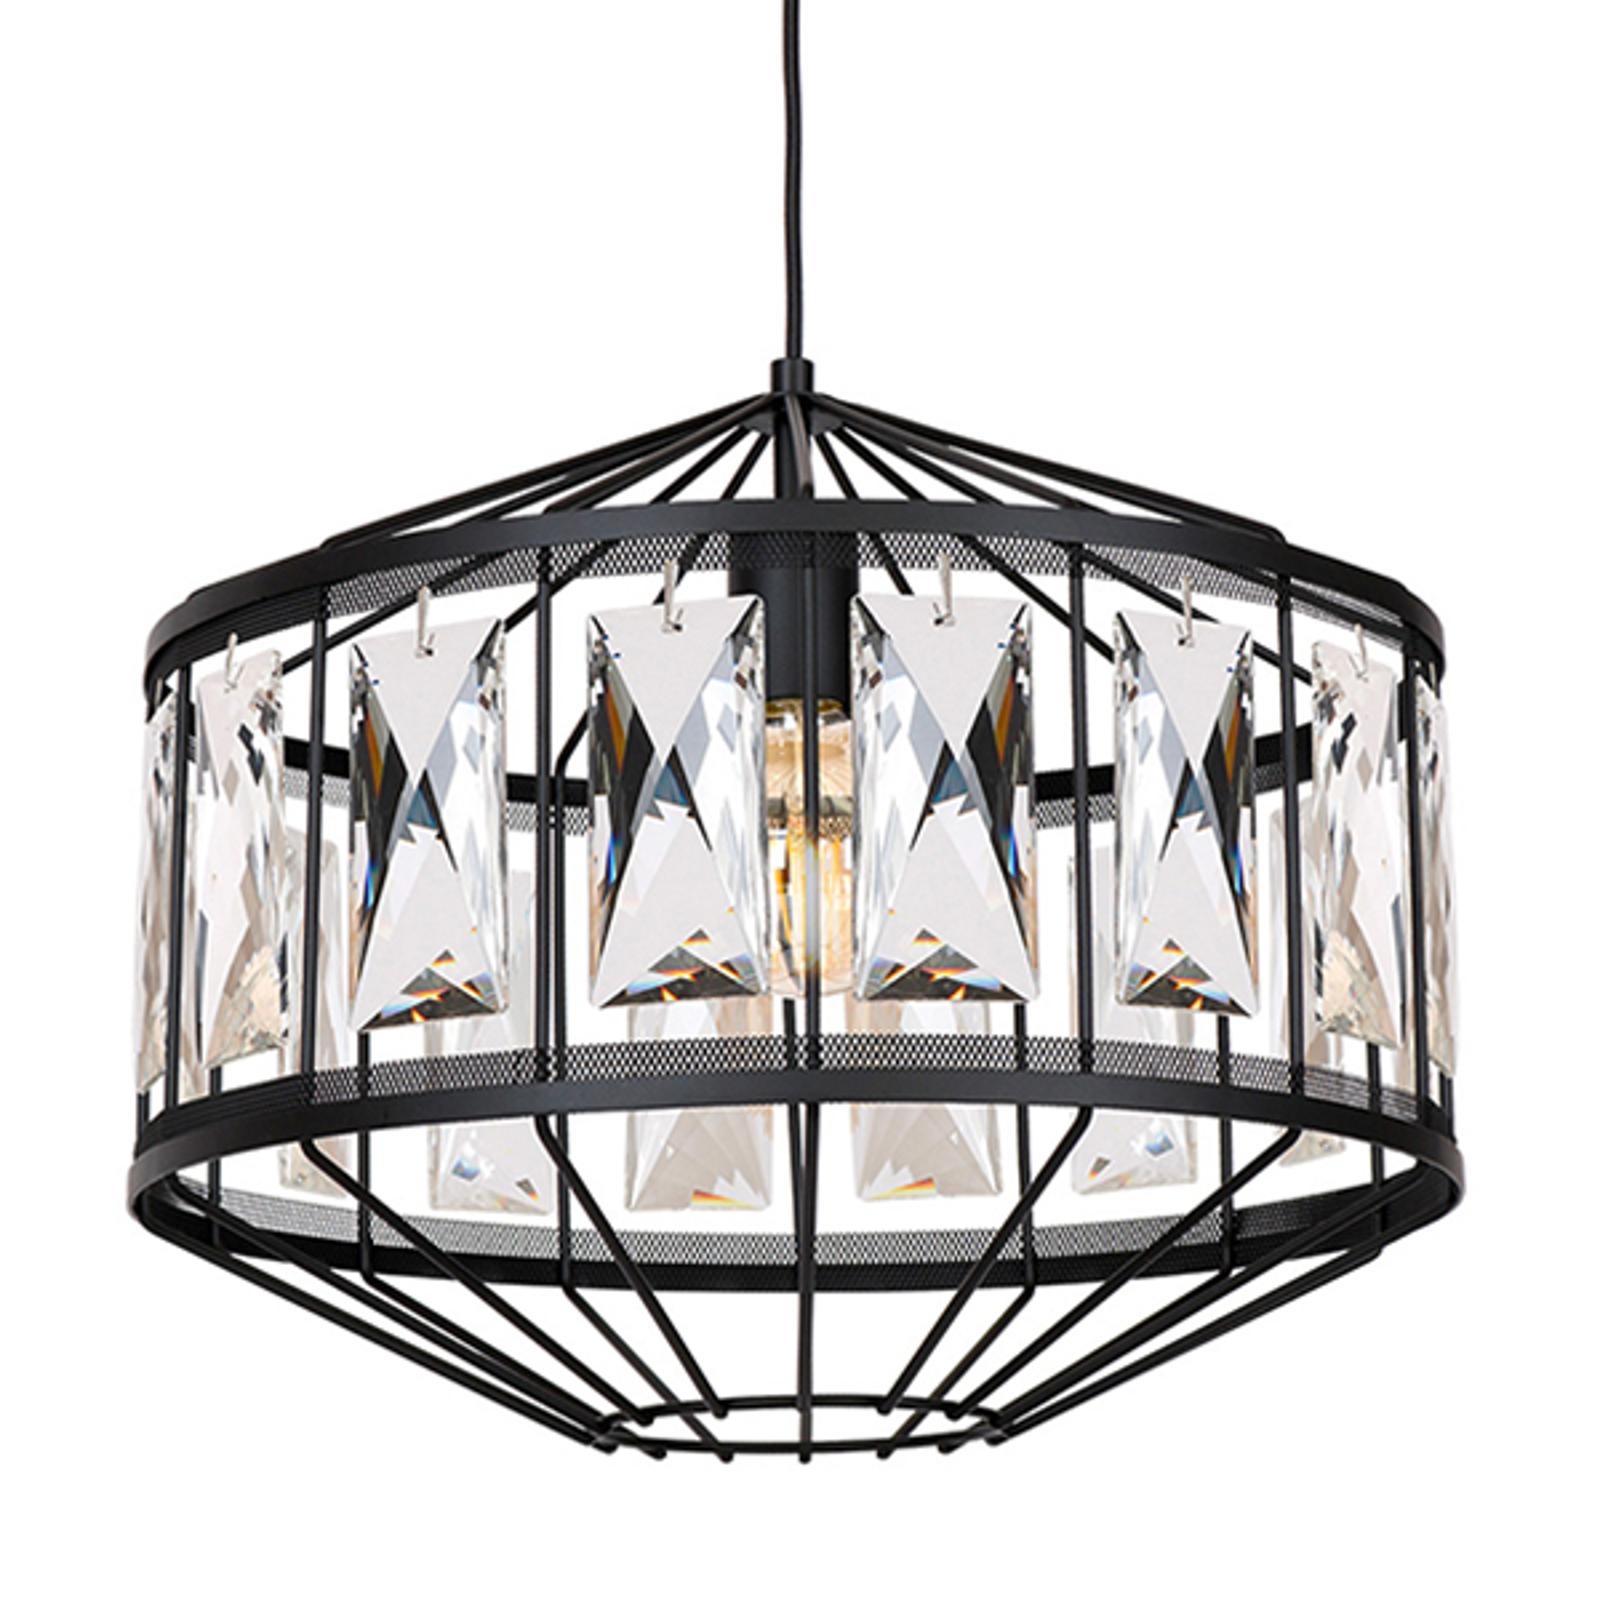 Hanglamp Elegance, zwart, geslepen glas